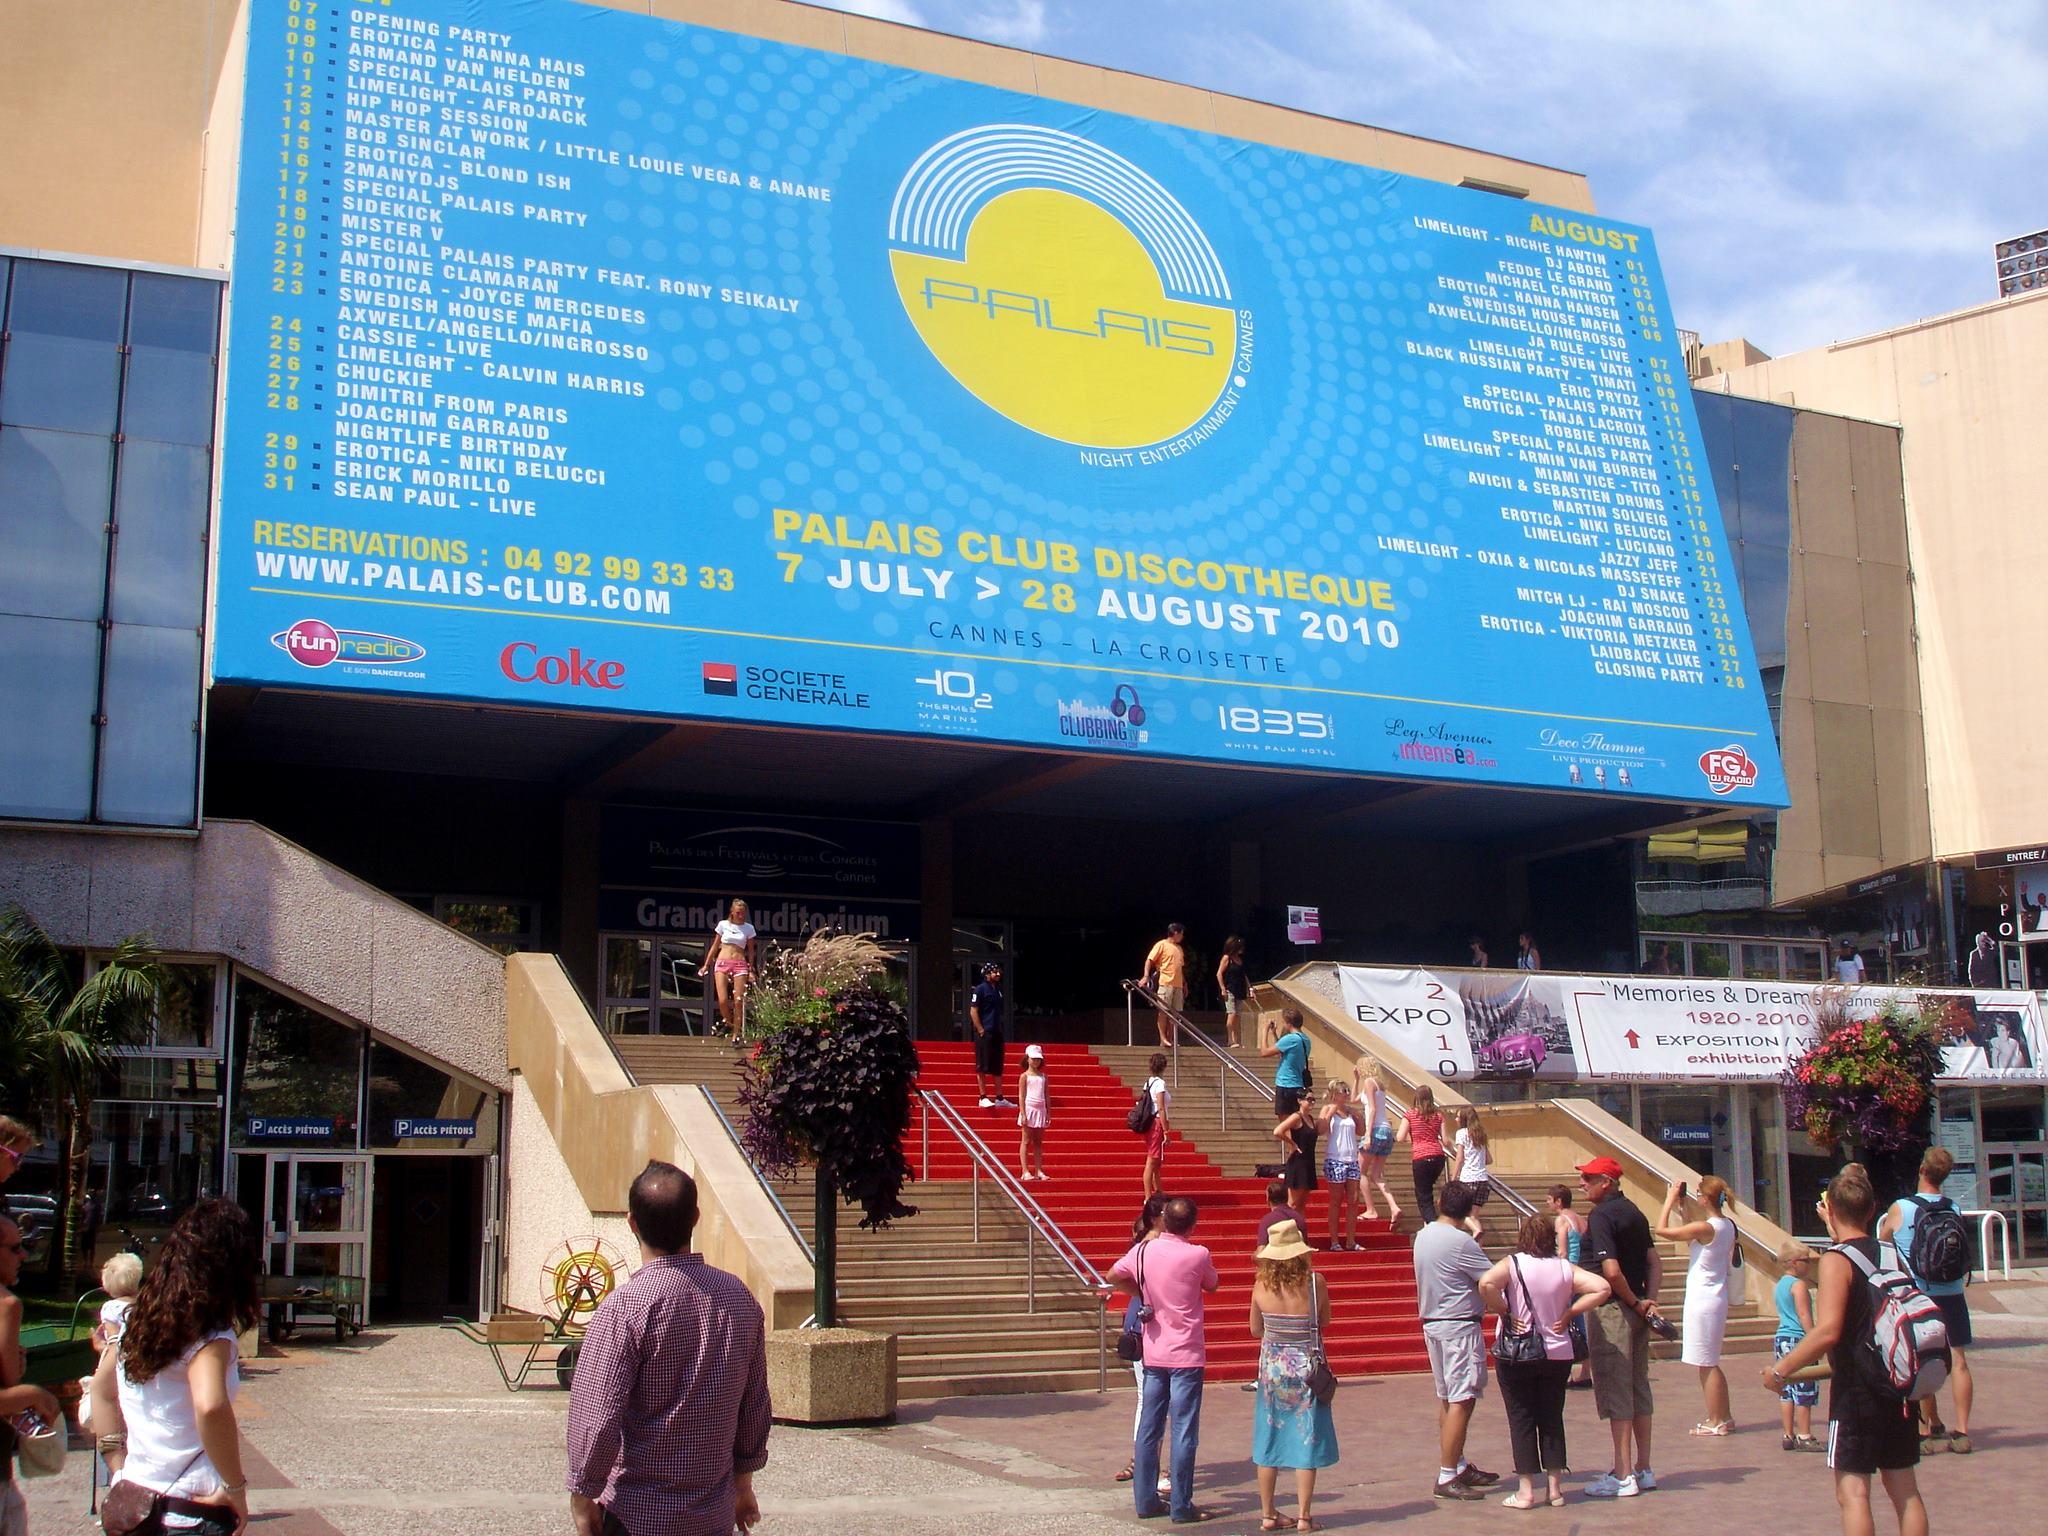 cannes_franca_palaisdesfestivals